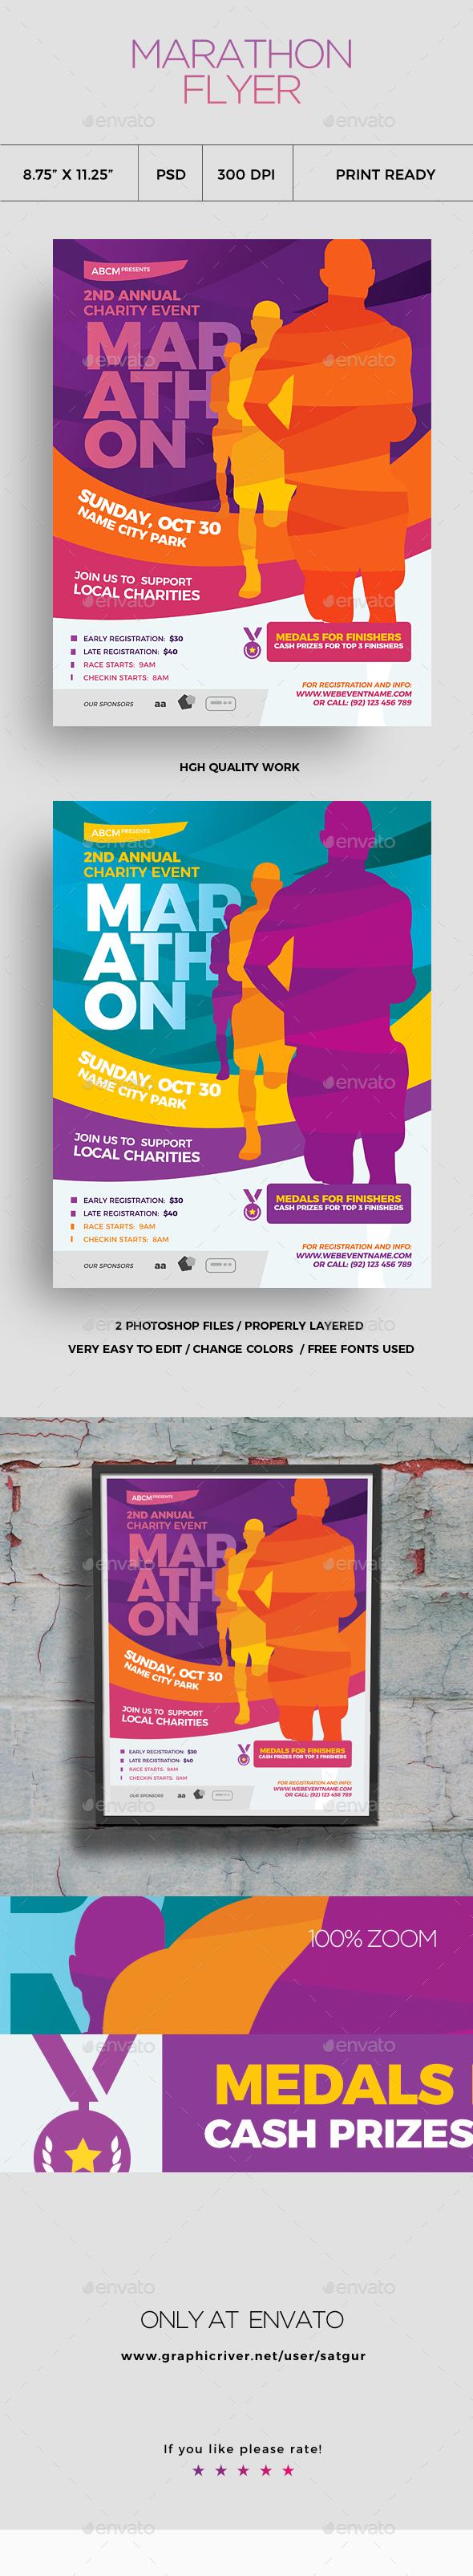 GraphicRiver Marathon Flyer Vol1 20330714